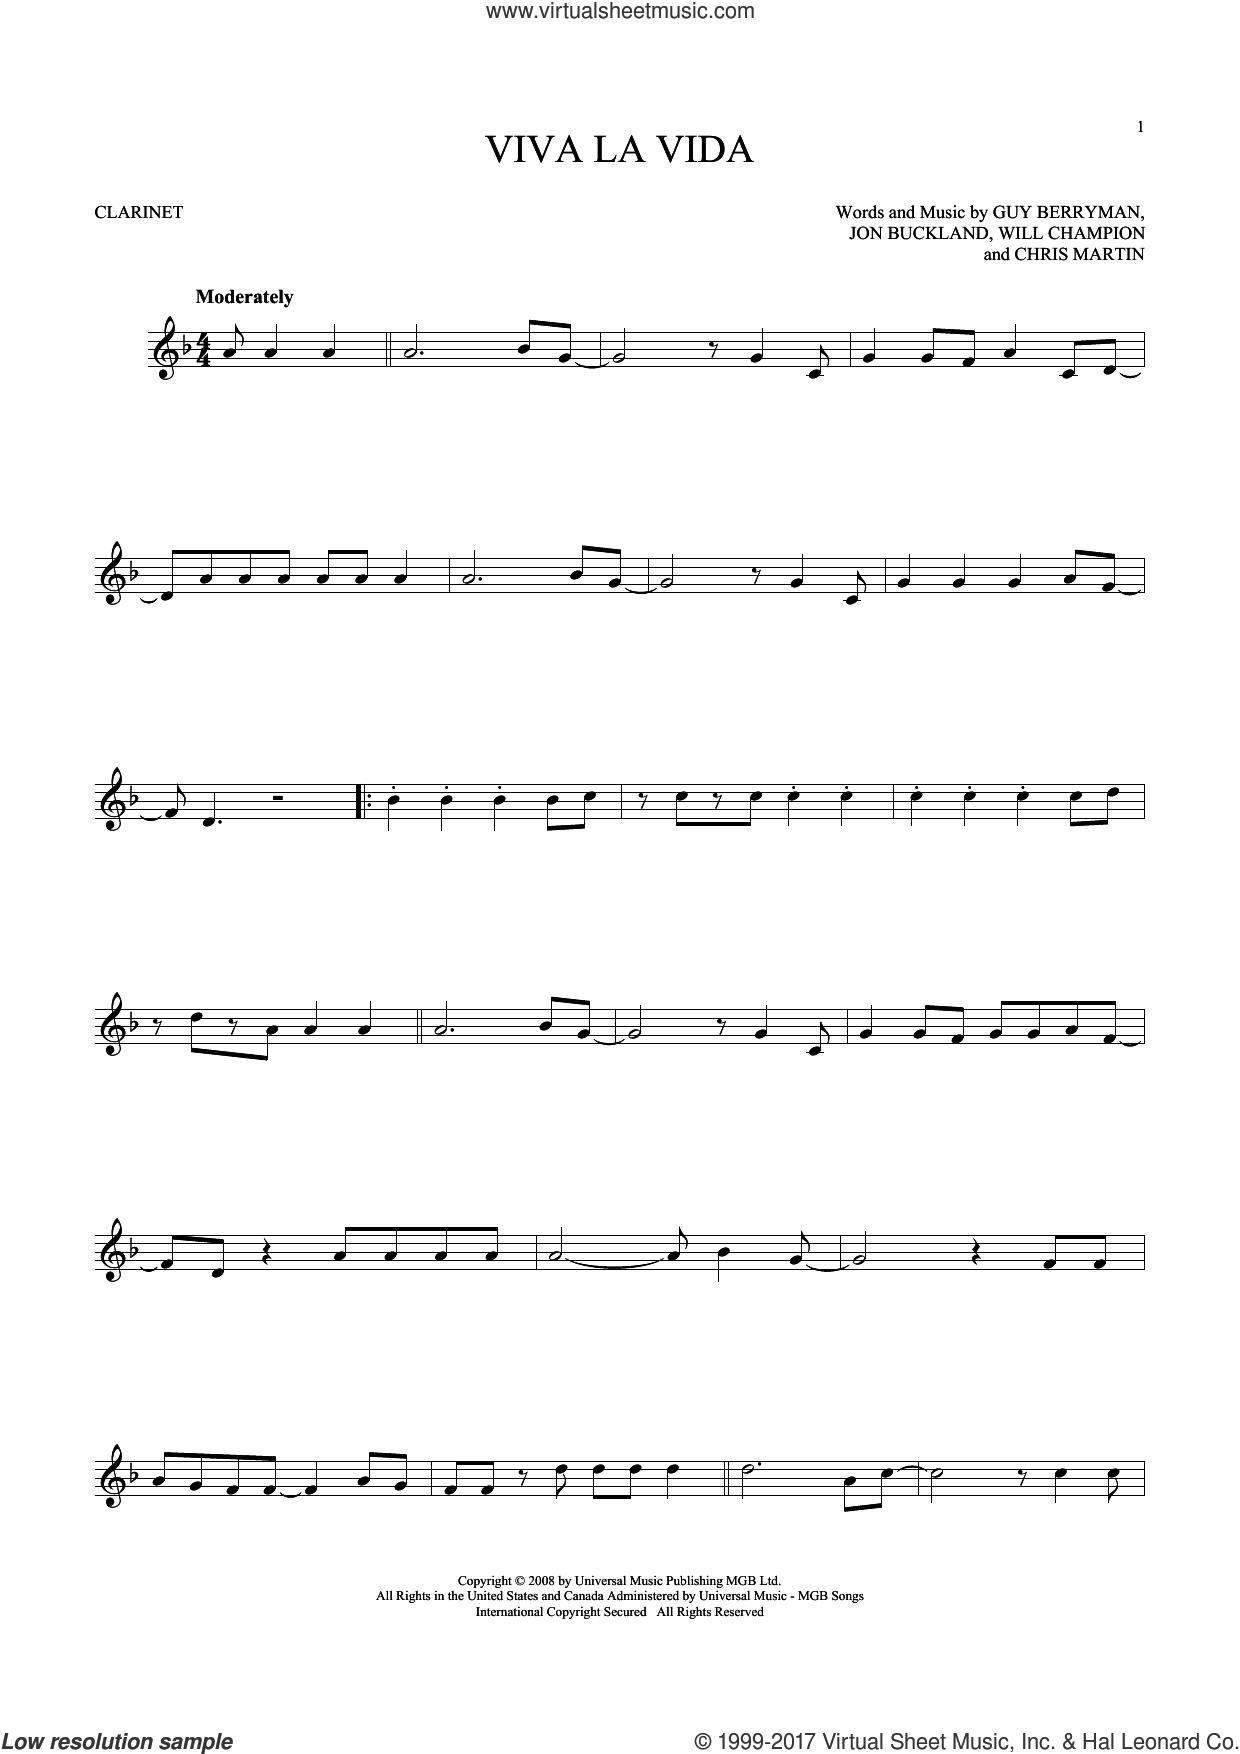 Viva La Vida sheet music for clarinet solo by Guy Berryman, Coldplay, Chris Martin, Jon Buckland and Will Champion, intermediate skill level